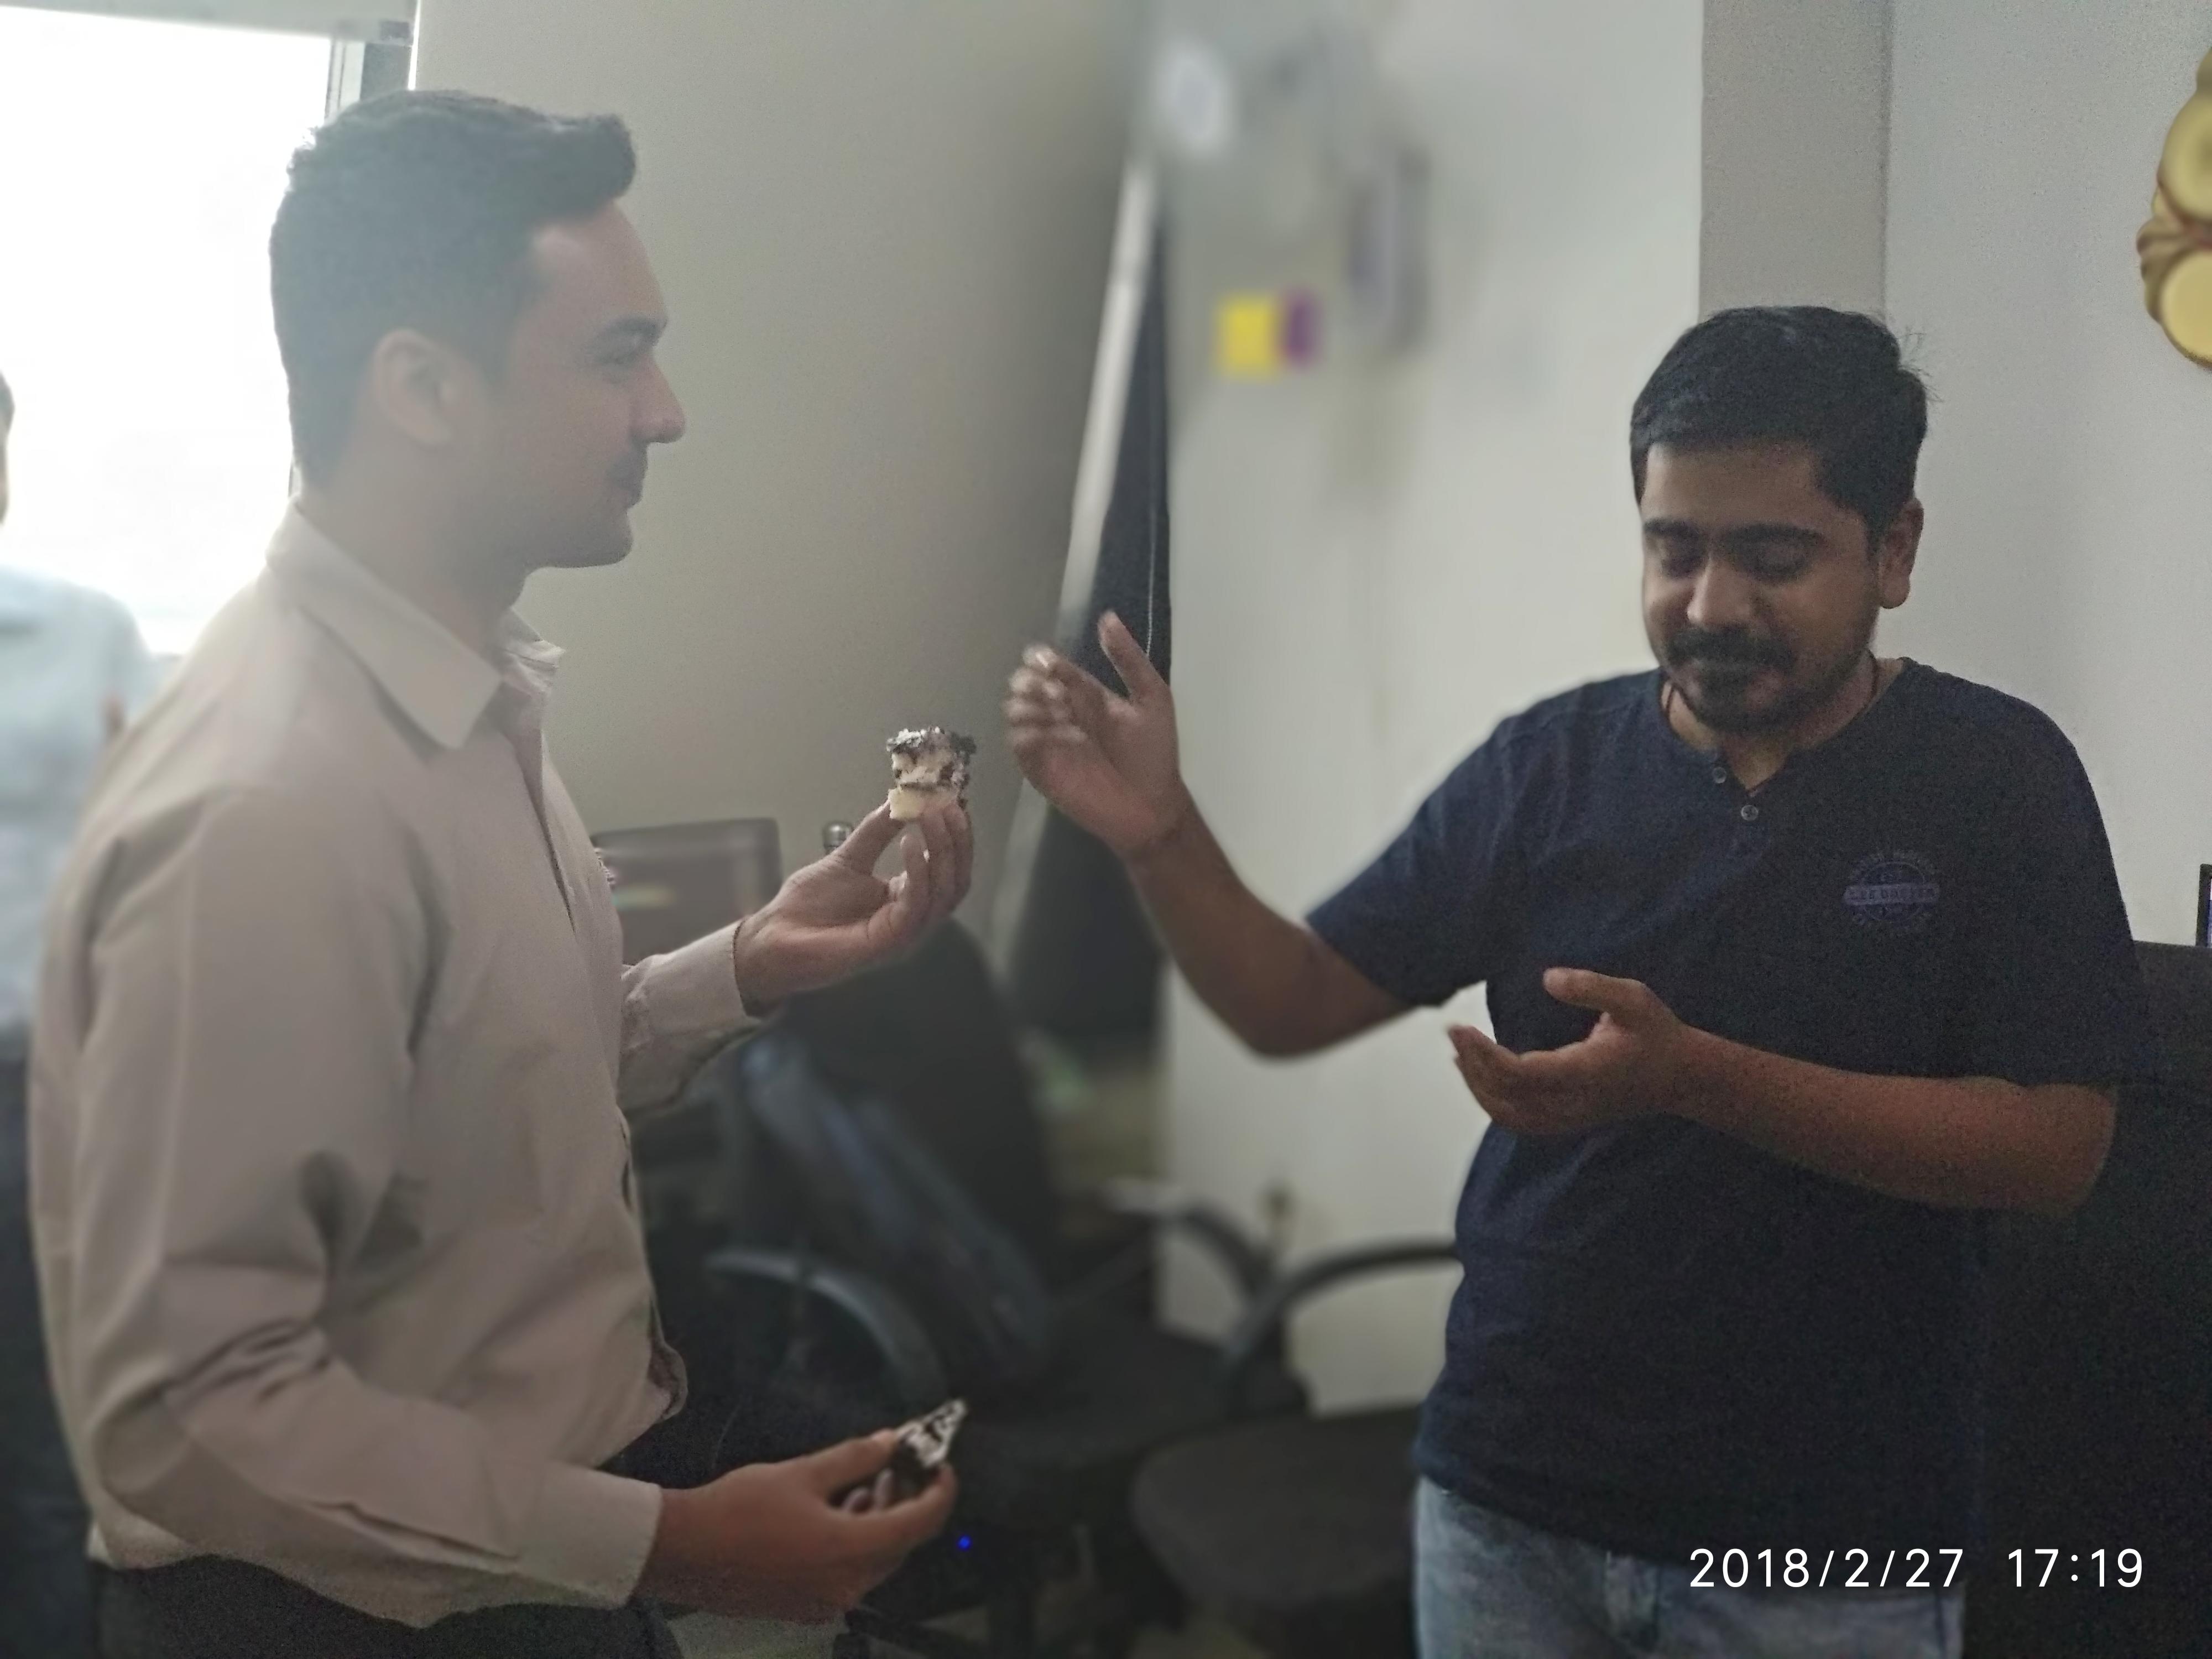 Kamleshbhai and nawazbhai